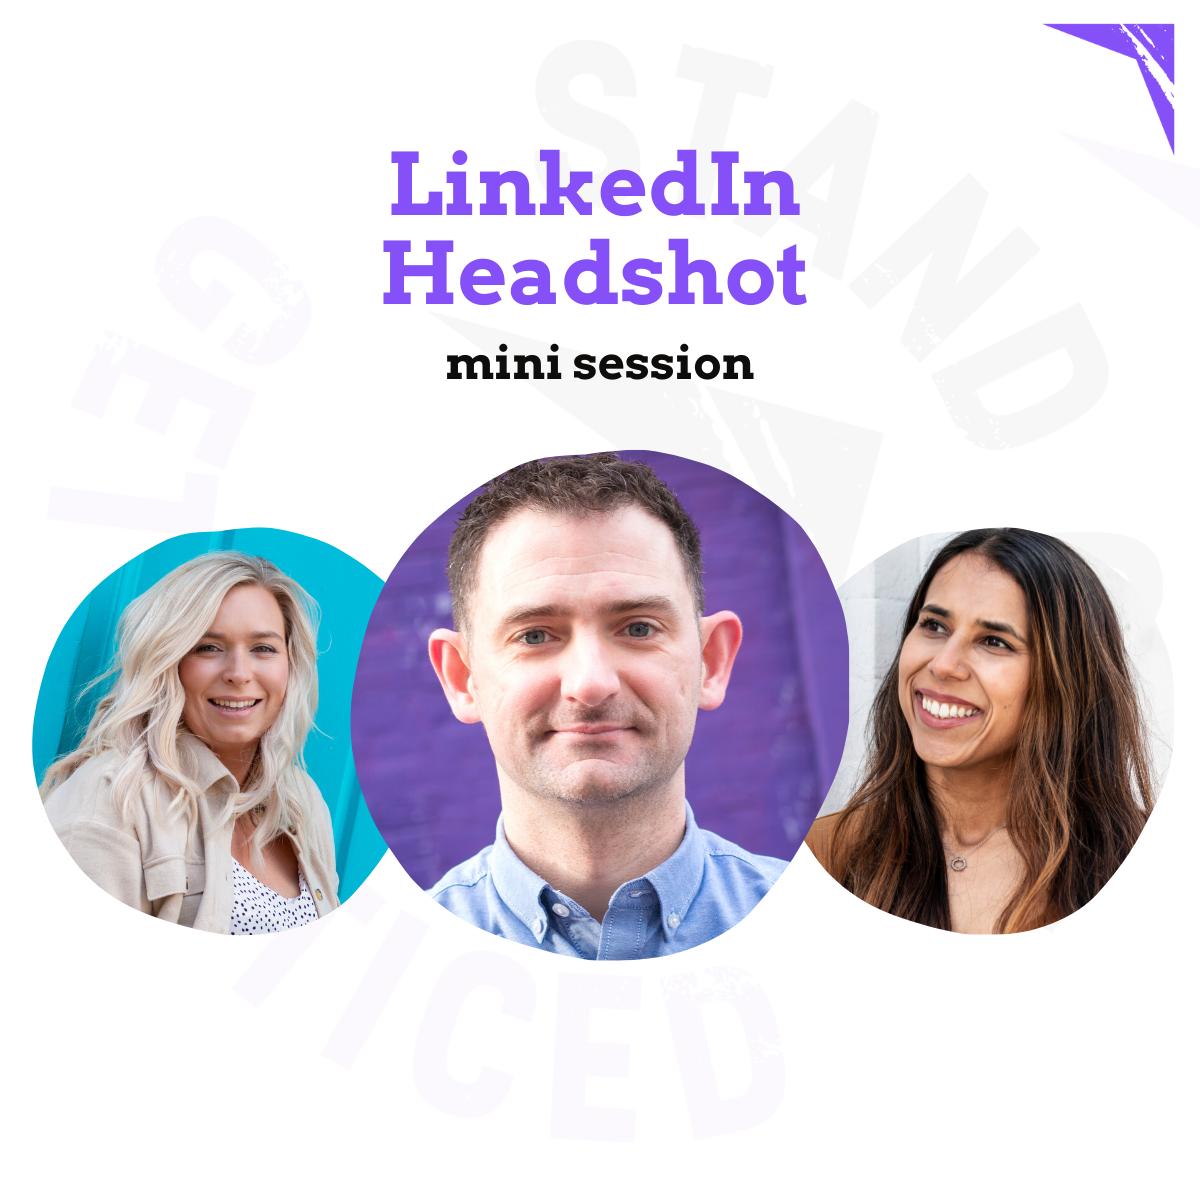 LinkedIn Headshot mini session